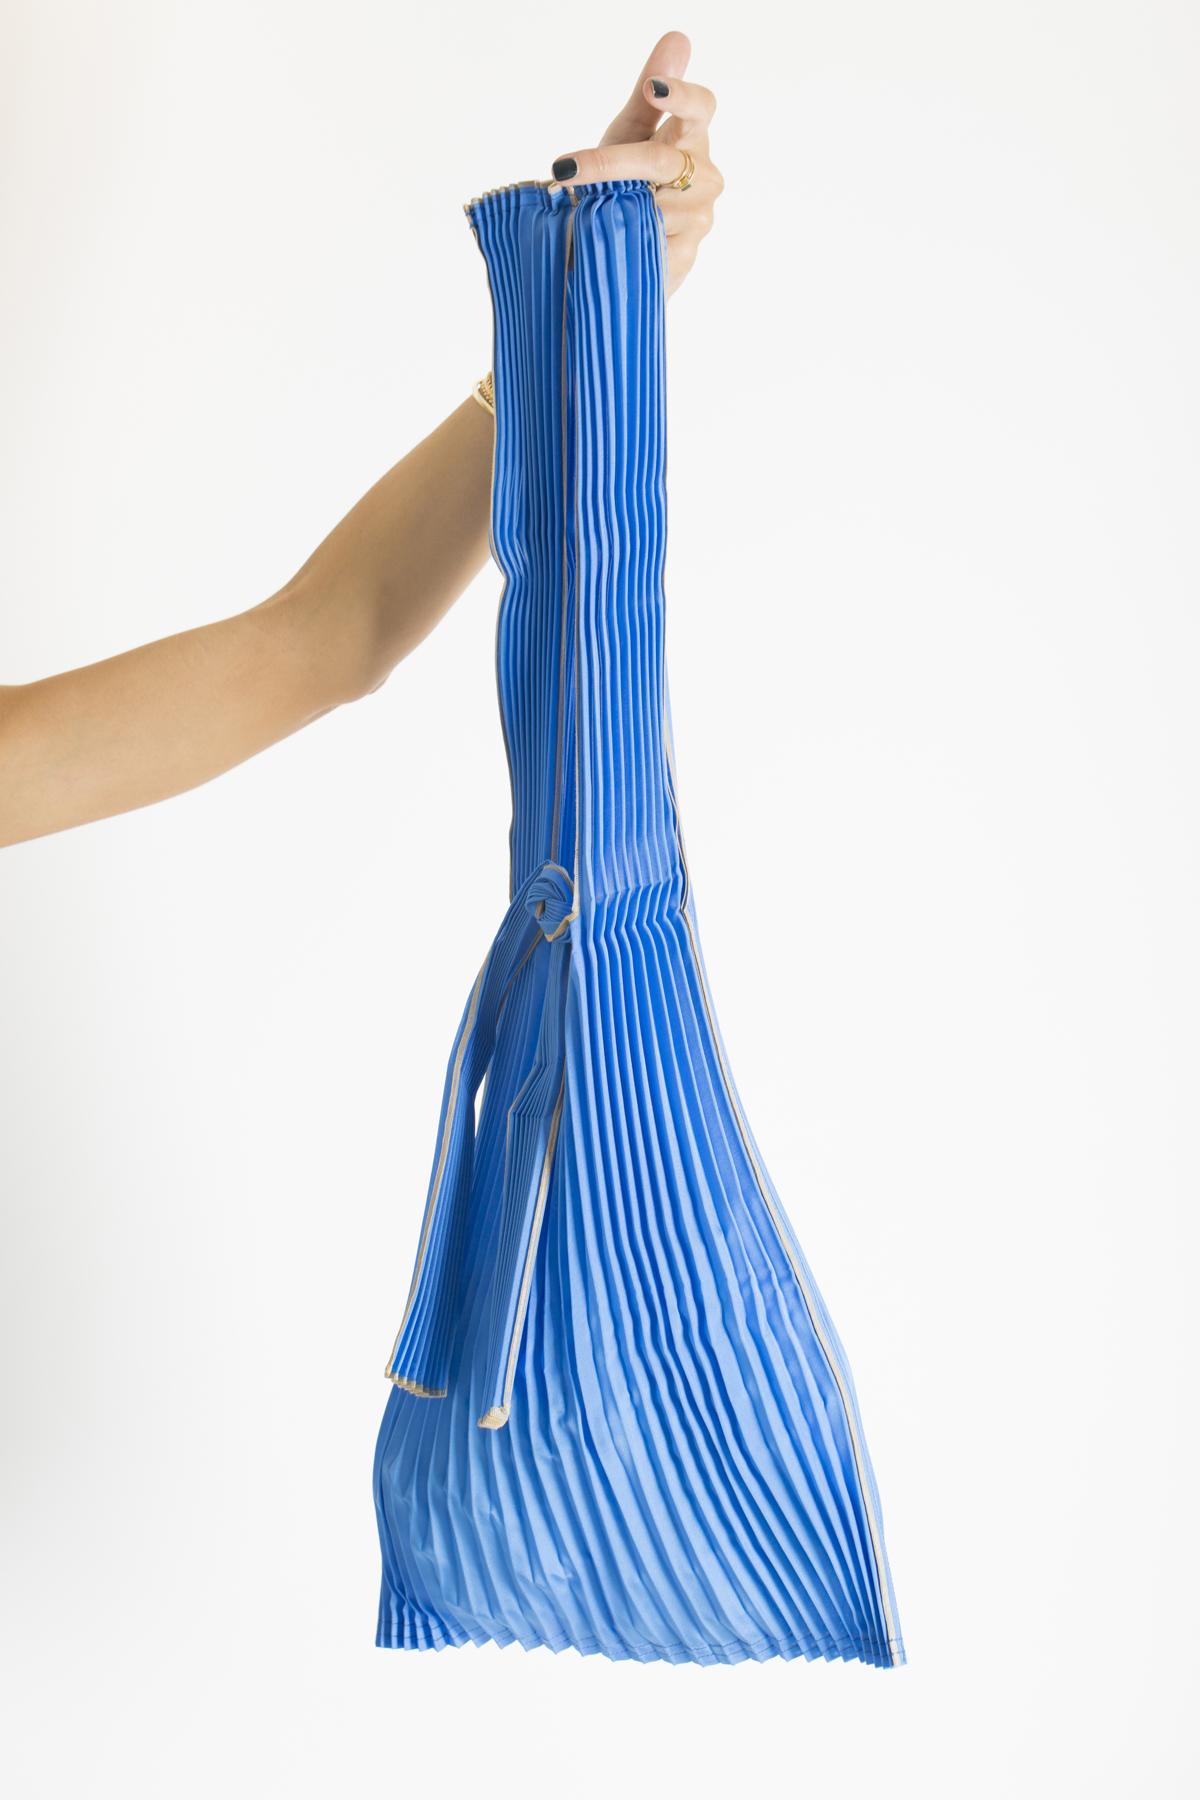 tote-pleco-large-blue-bag-matchboxathens